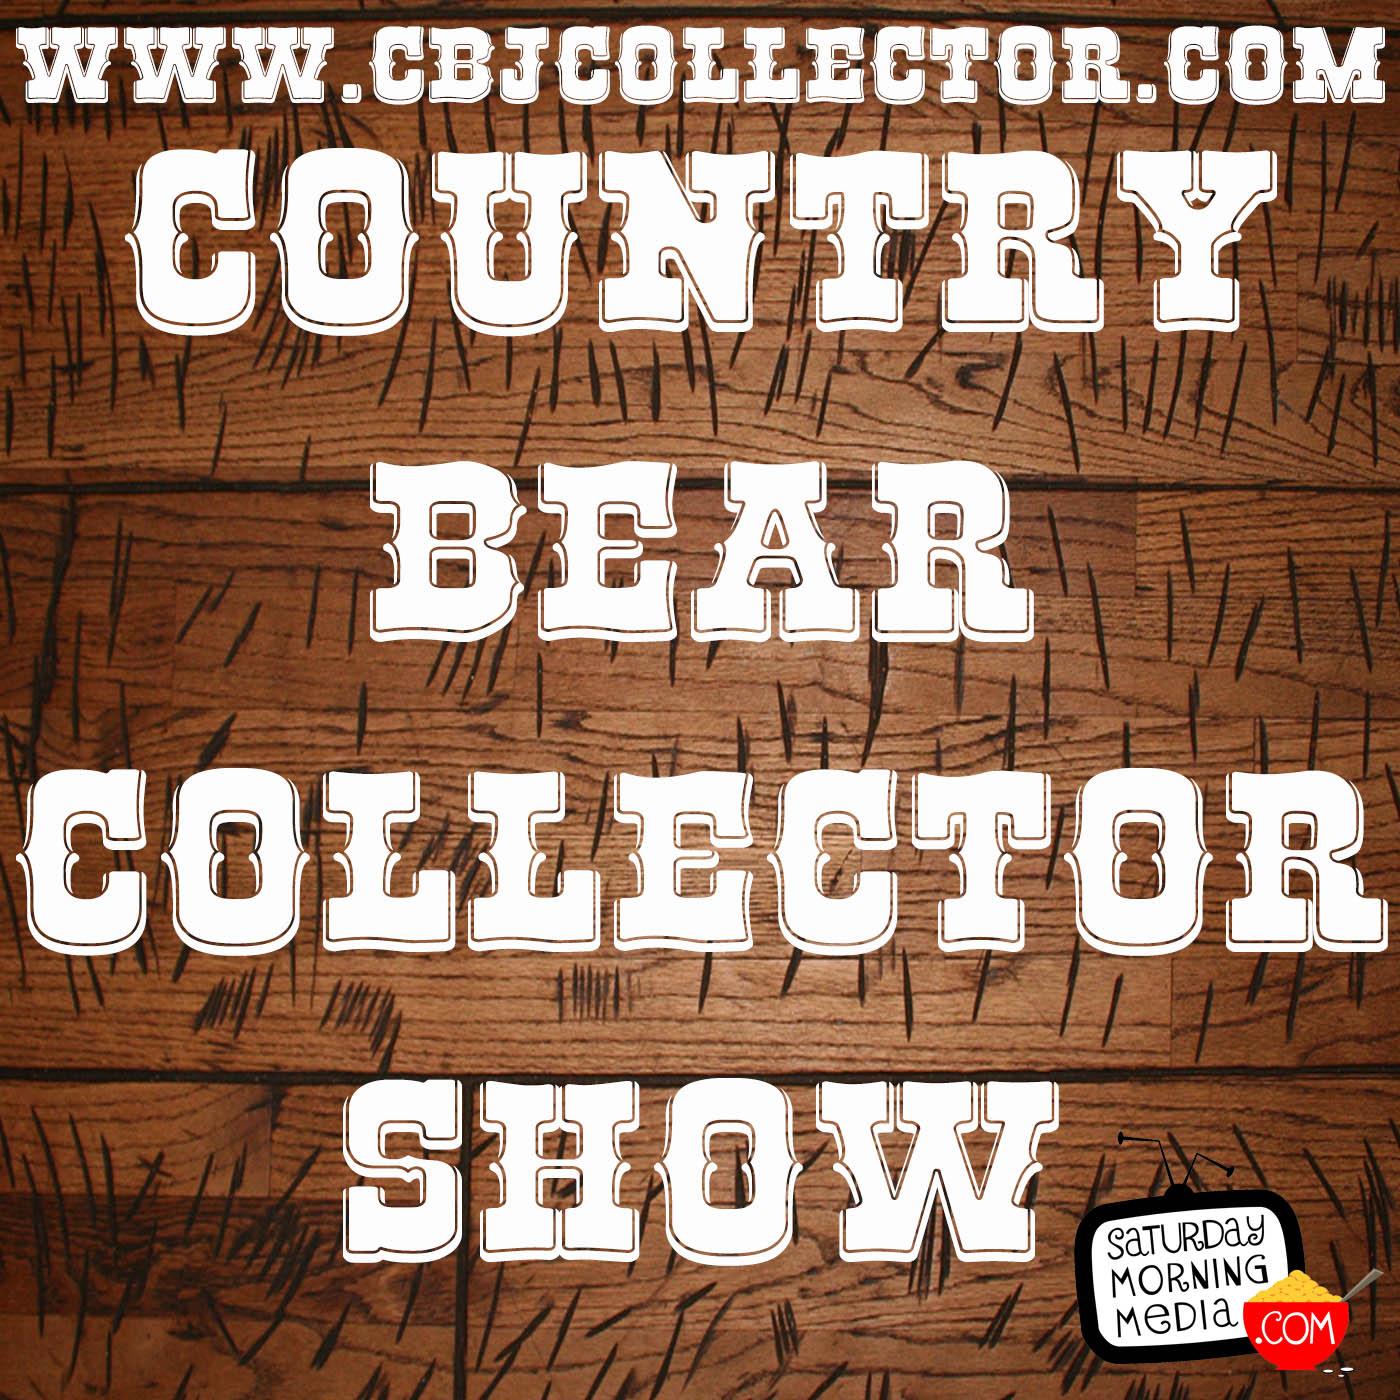 Artwork for 2018 Fantasyland Football Buff Pin - Country Bear Collector Show #140